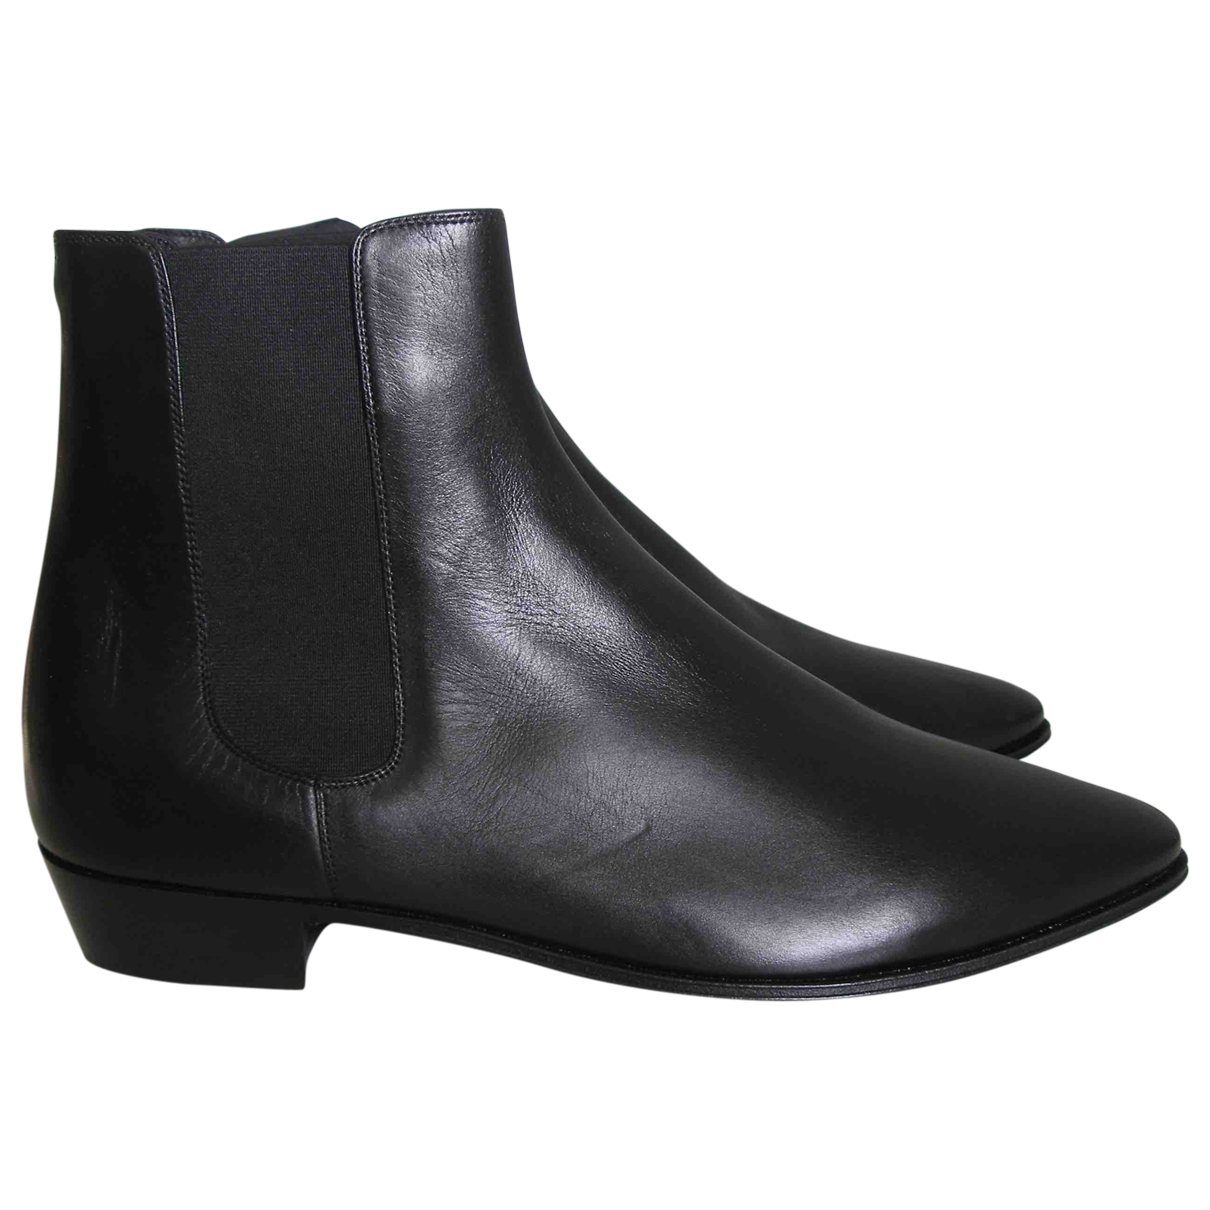 Celine \N Black Leather Boots for Women 42 EU